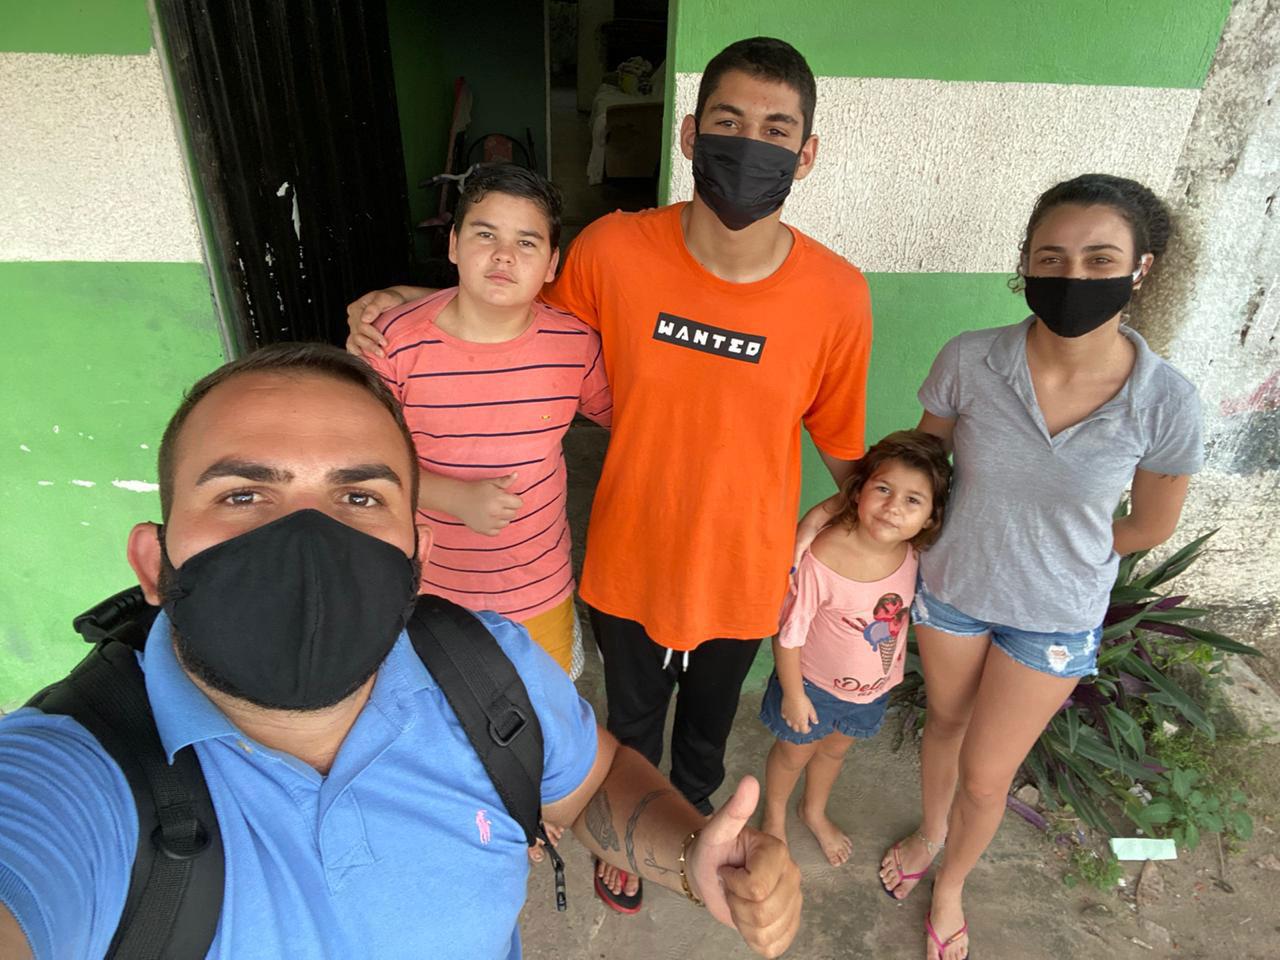 selfie radialista família motoboy bateu moto